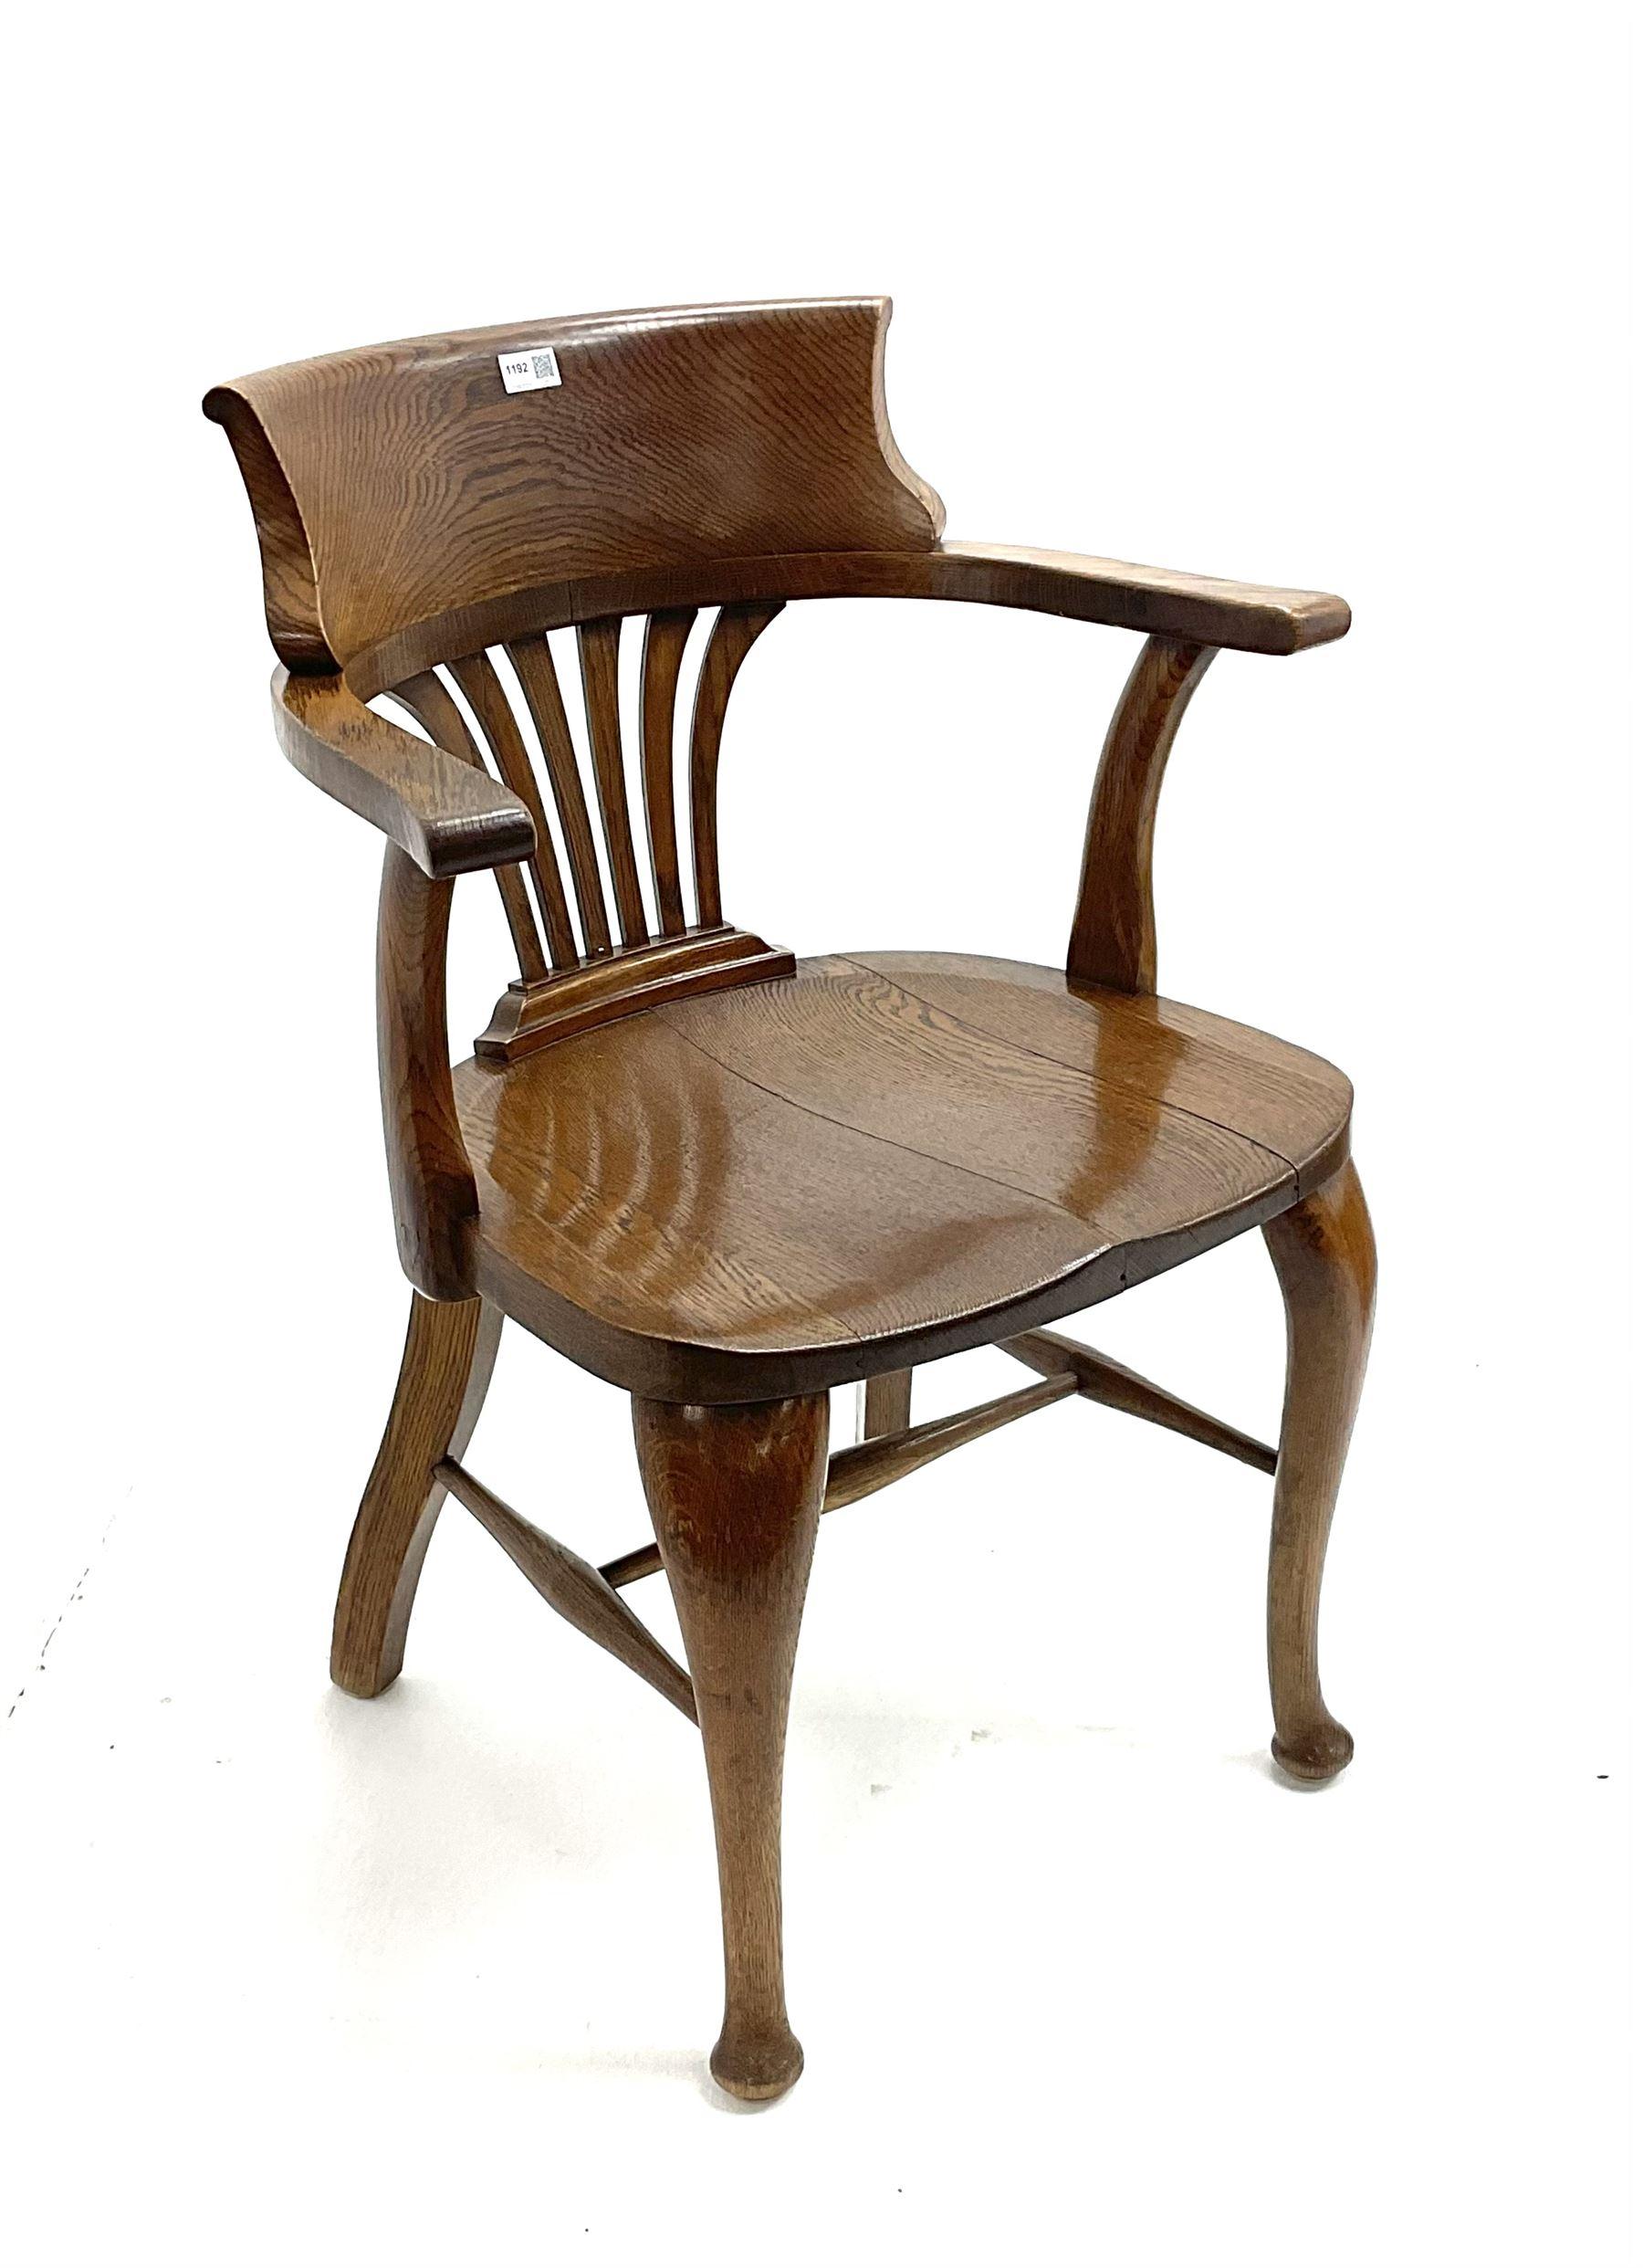 19th century oak desk chair - Image 2 of 2